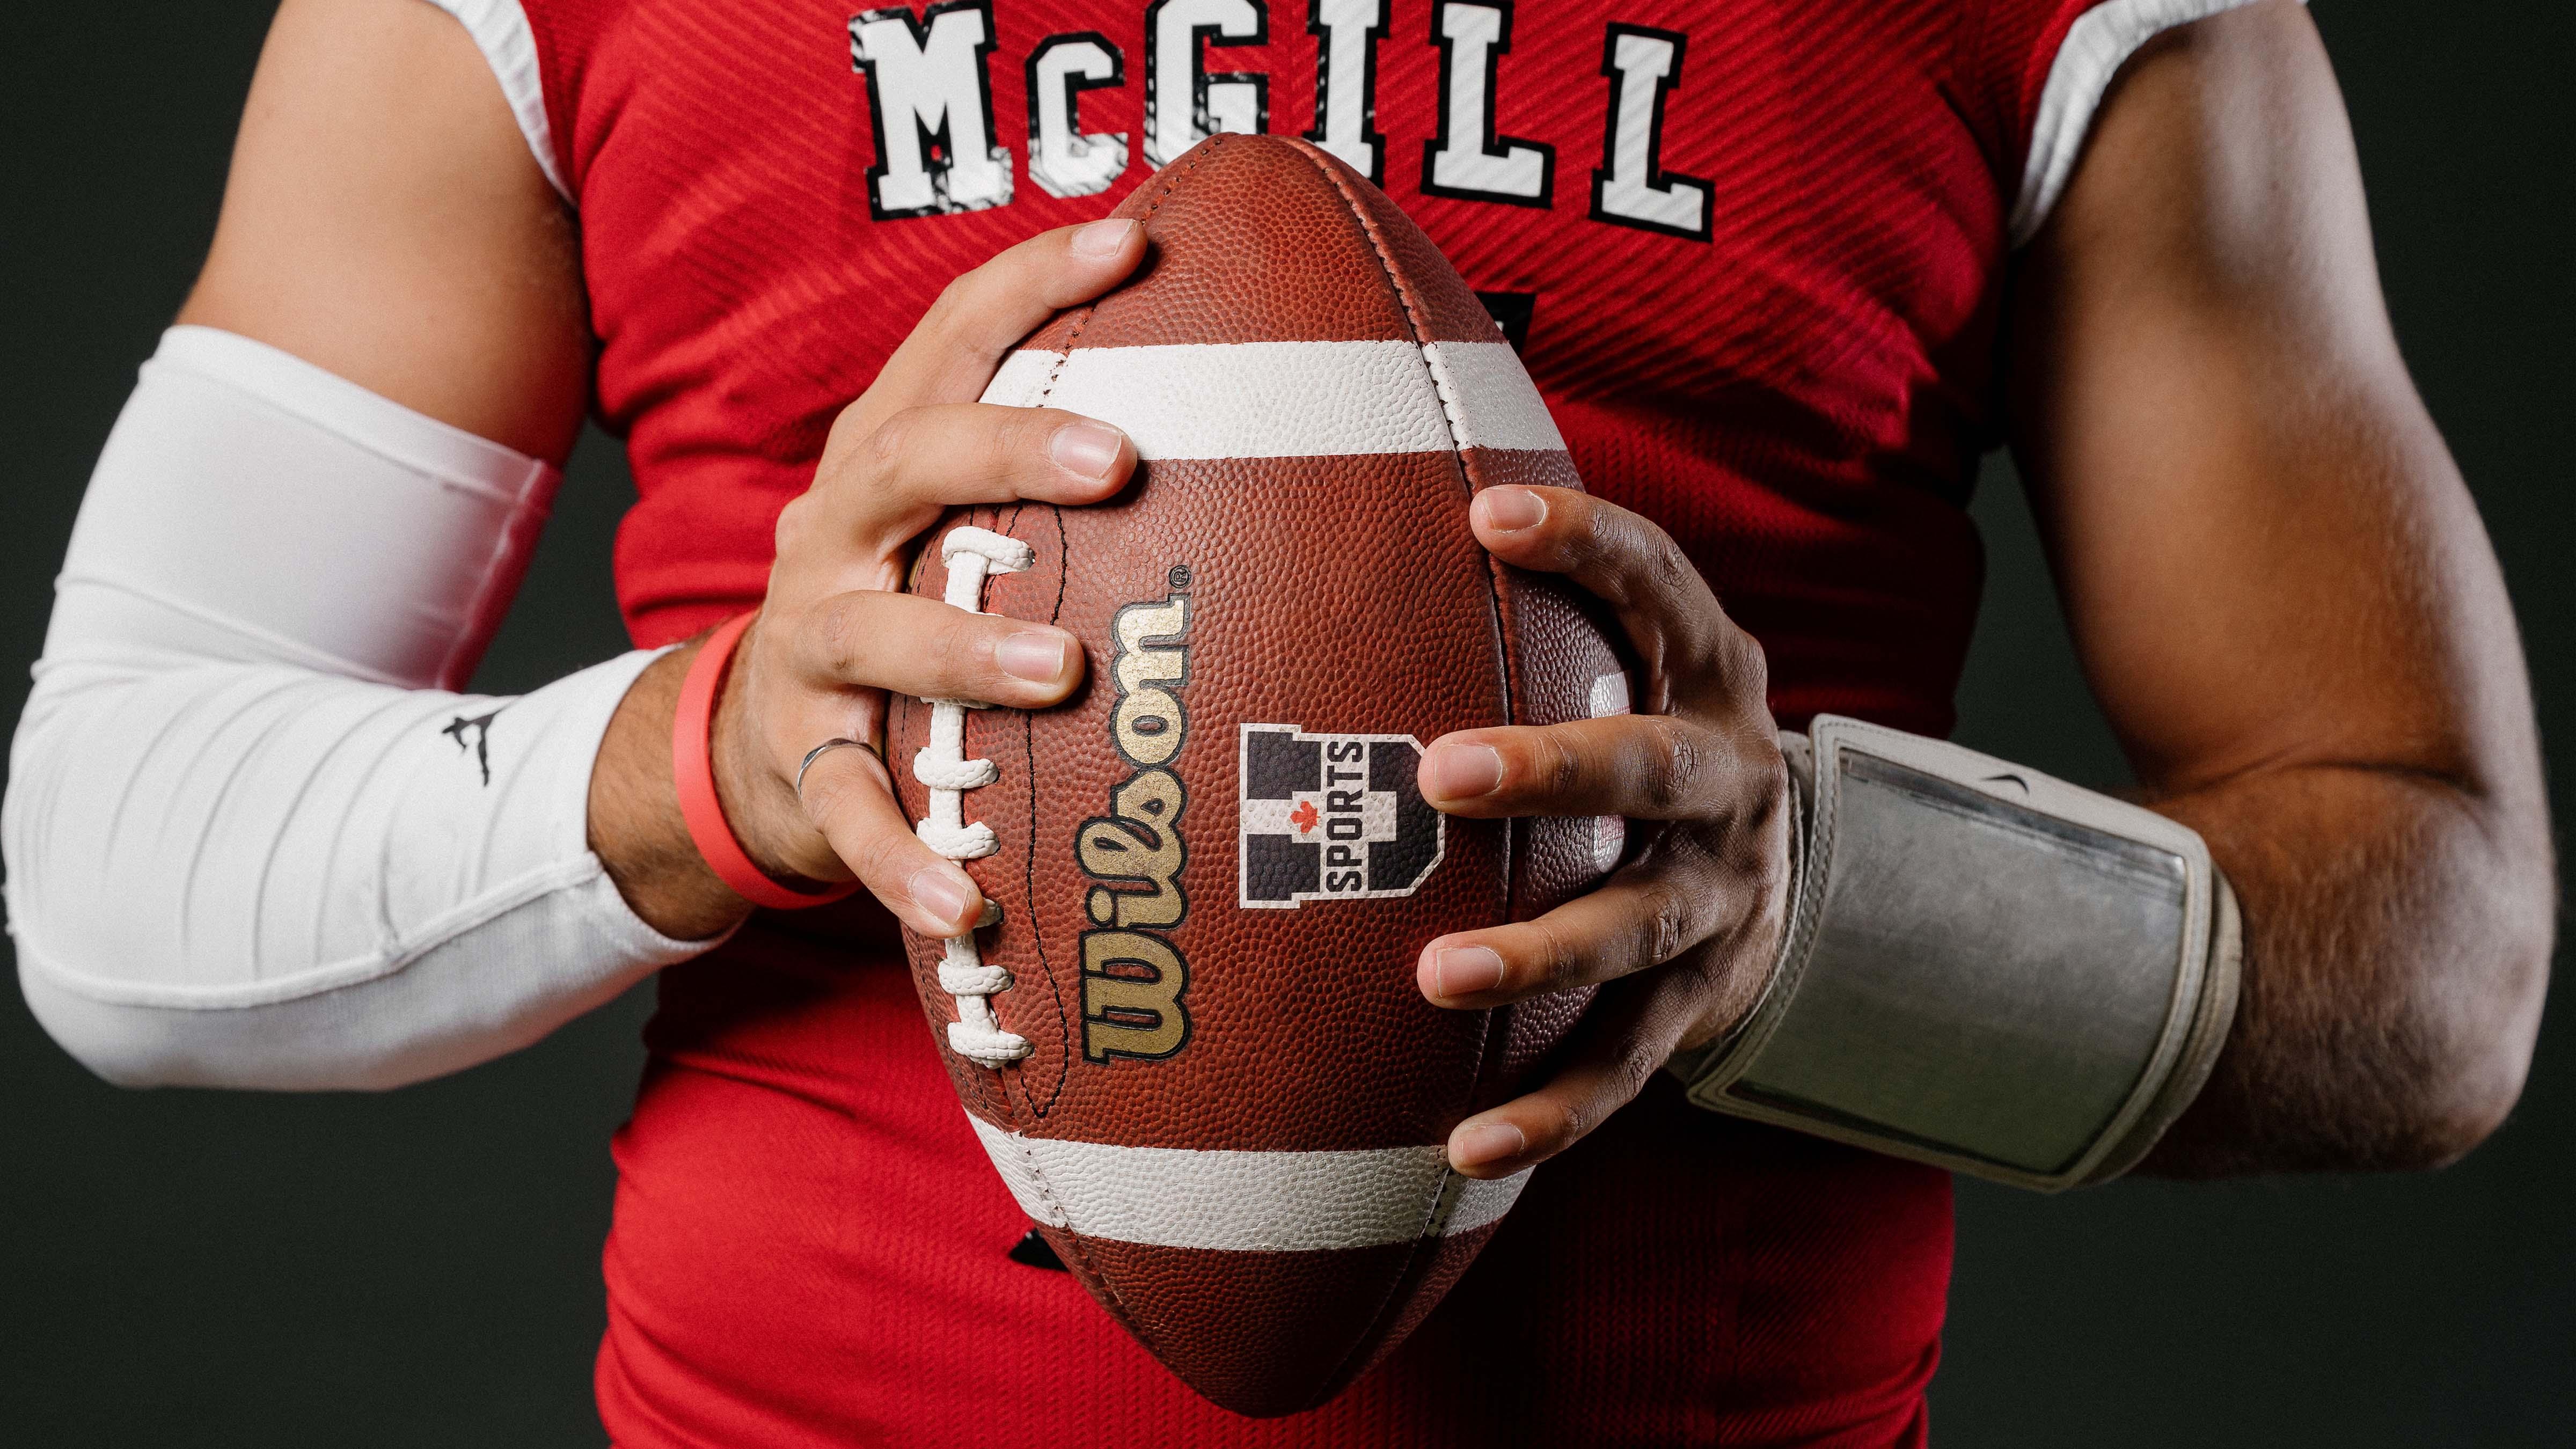 McGill University Athletics